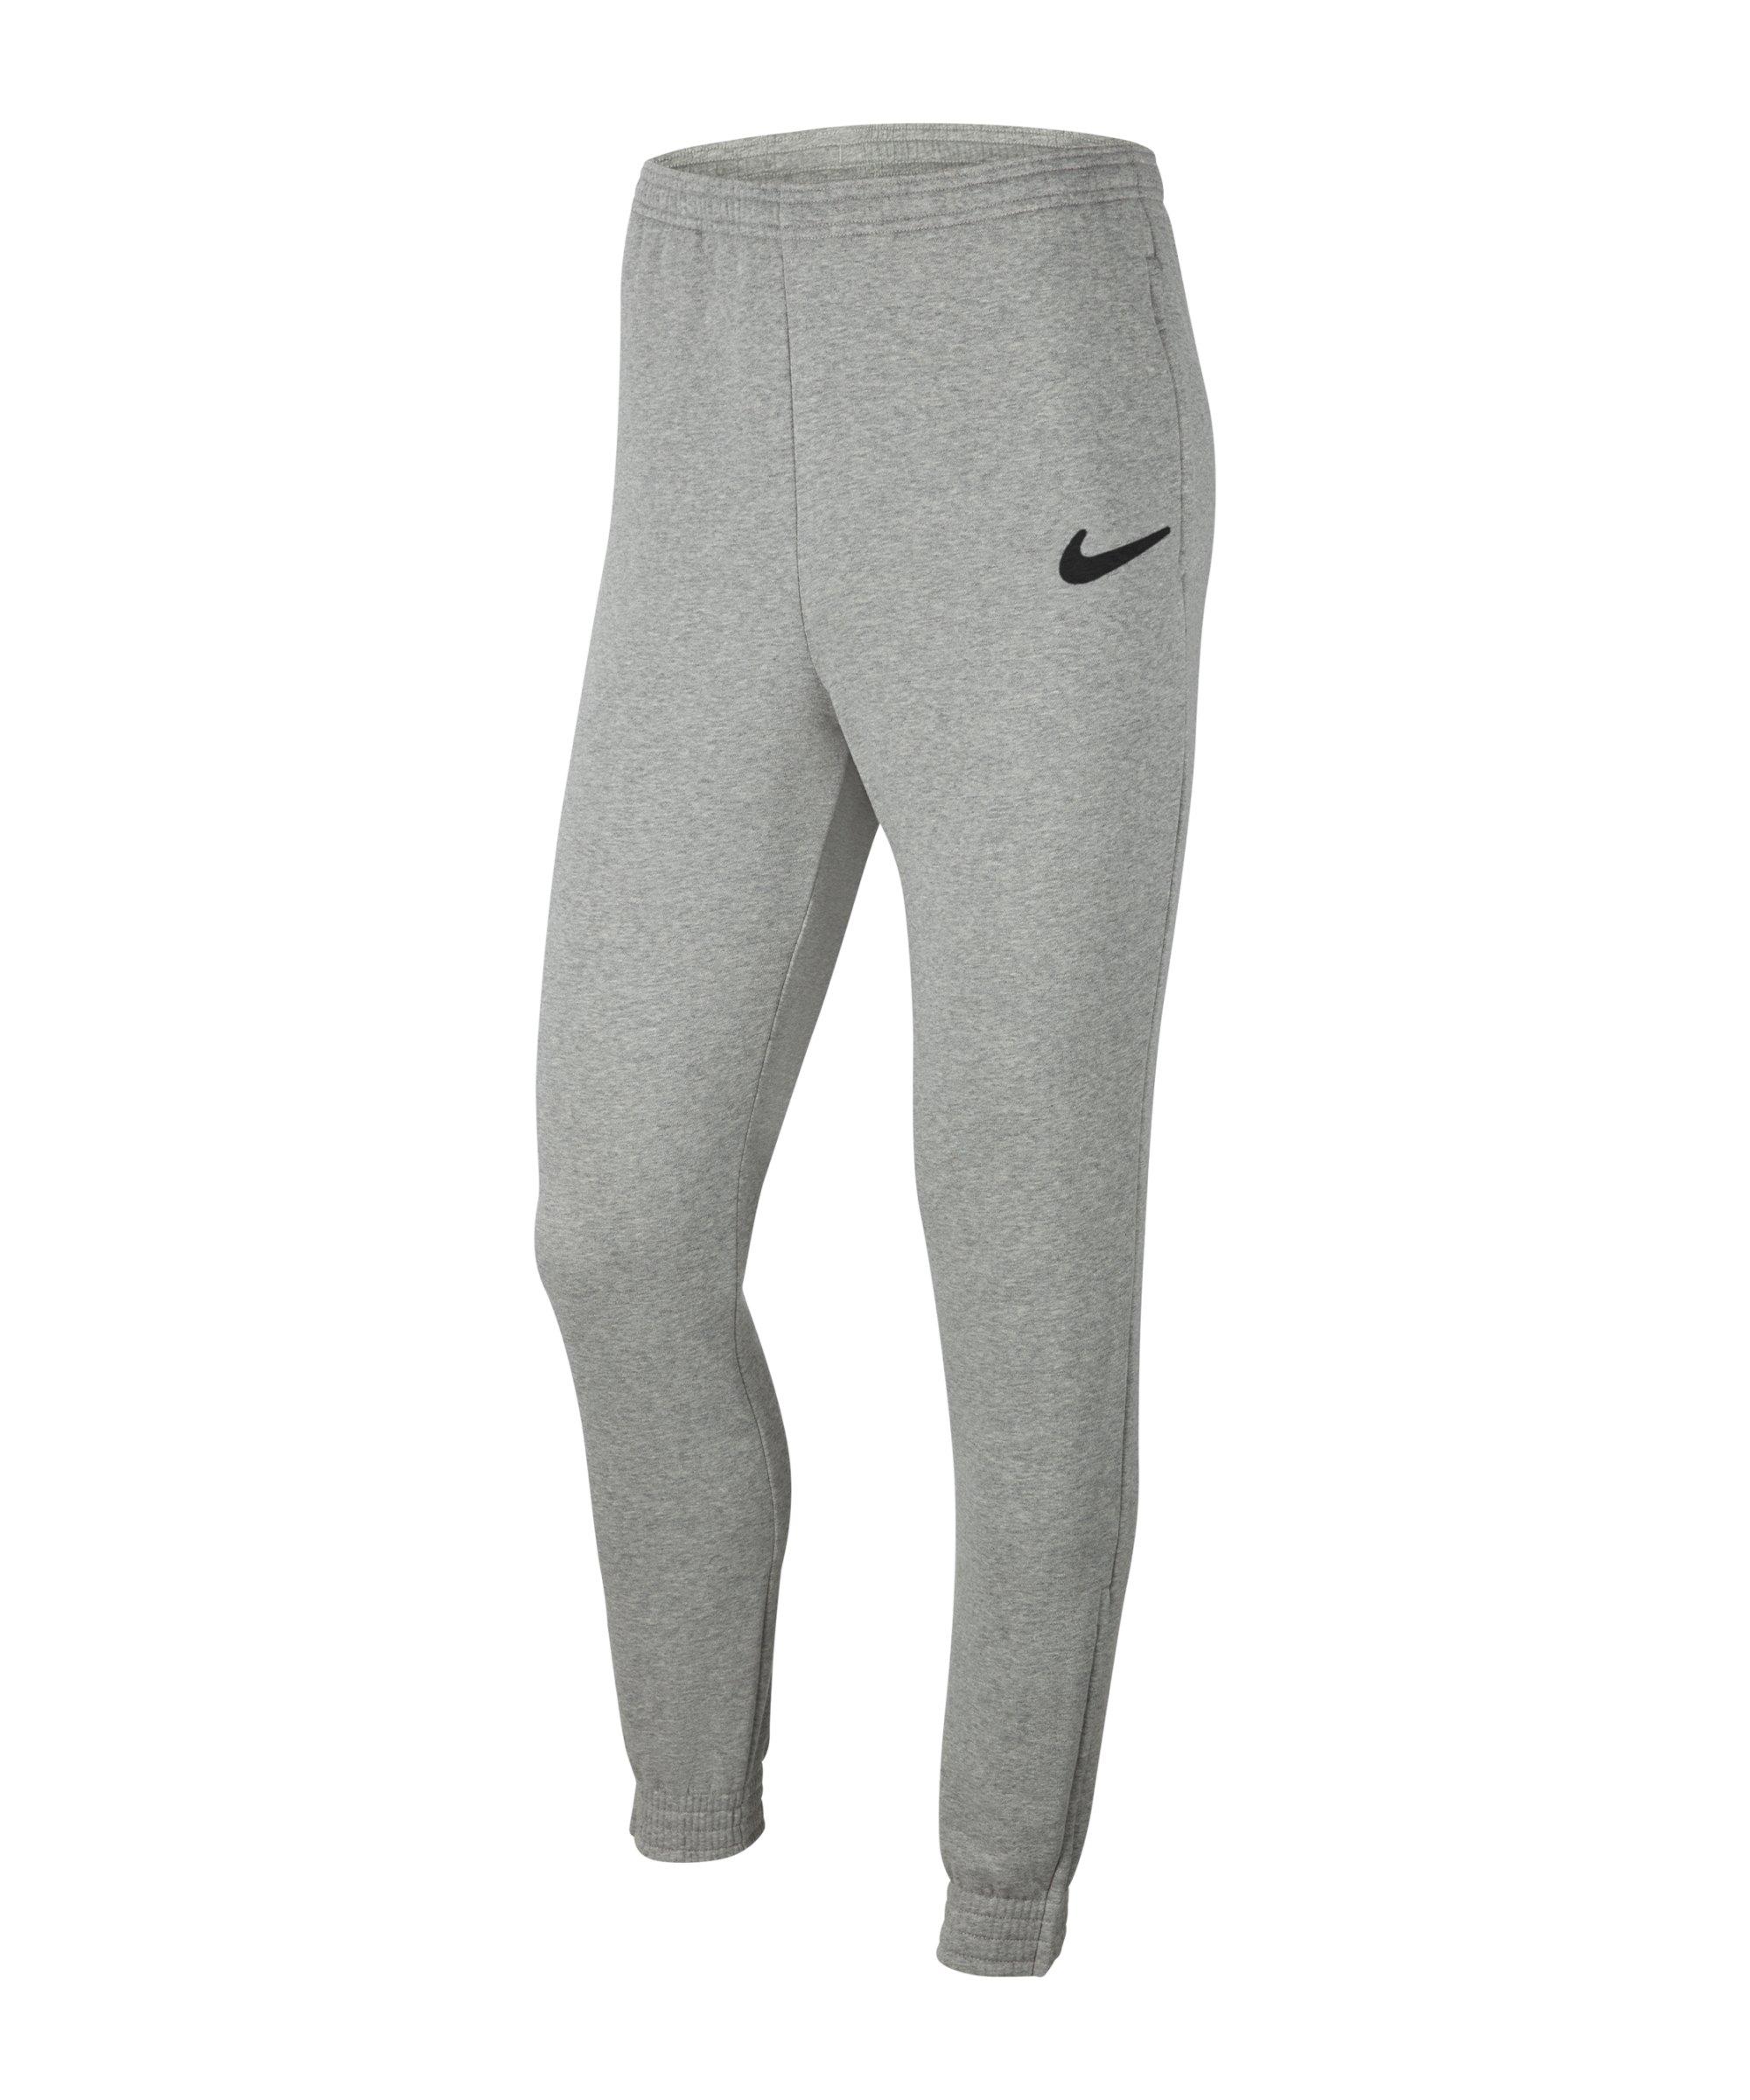 Nike Park 20 Fleece Jogginghose Grau F063 - grau